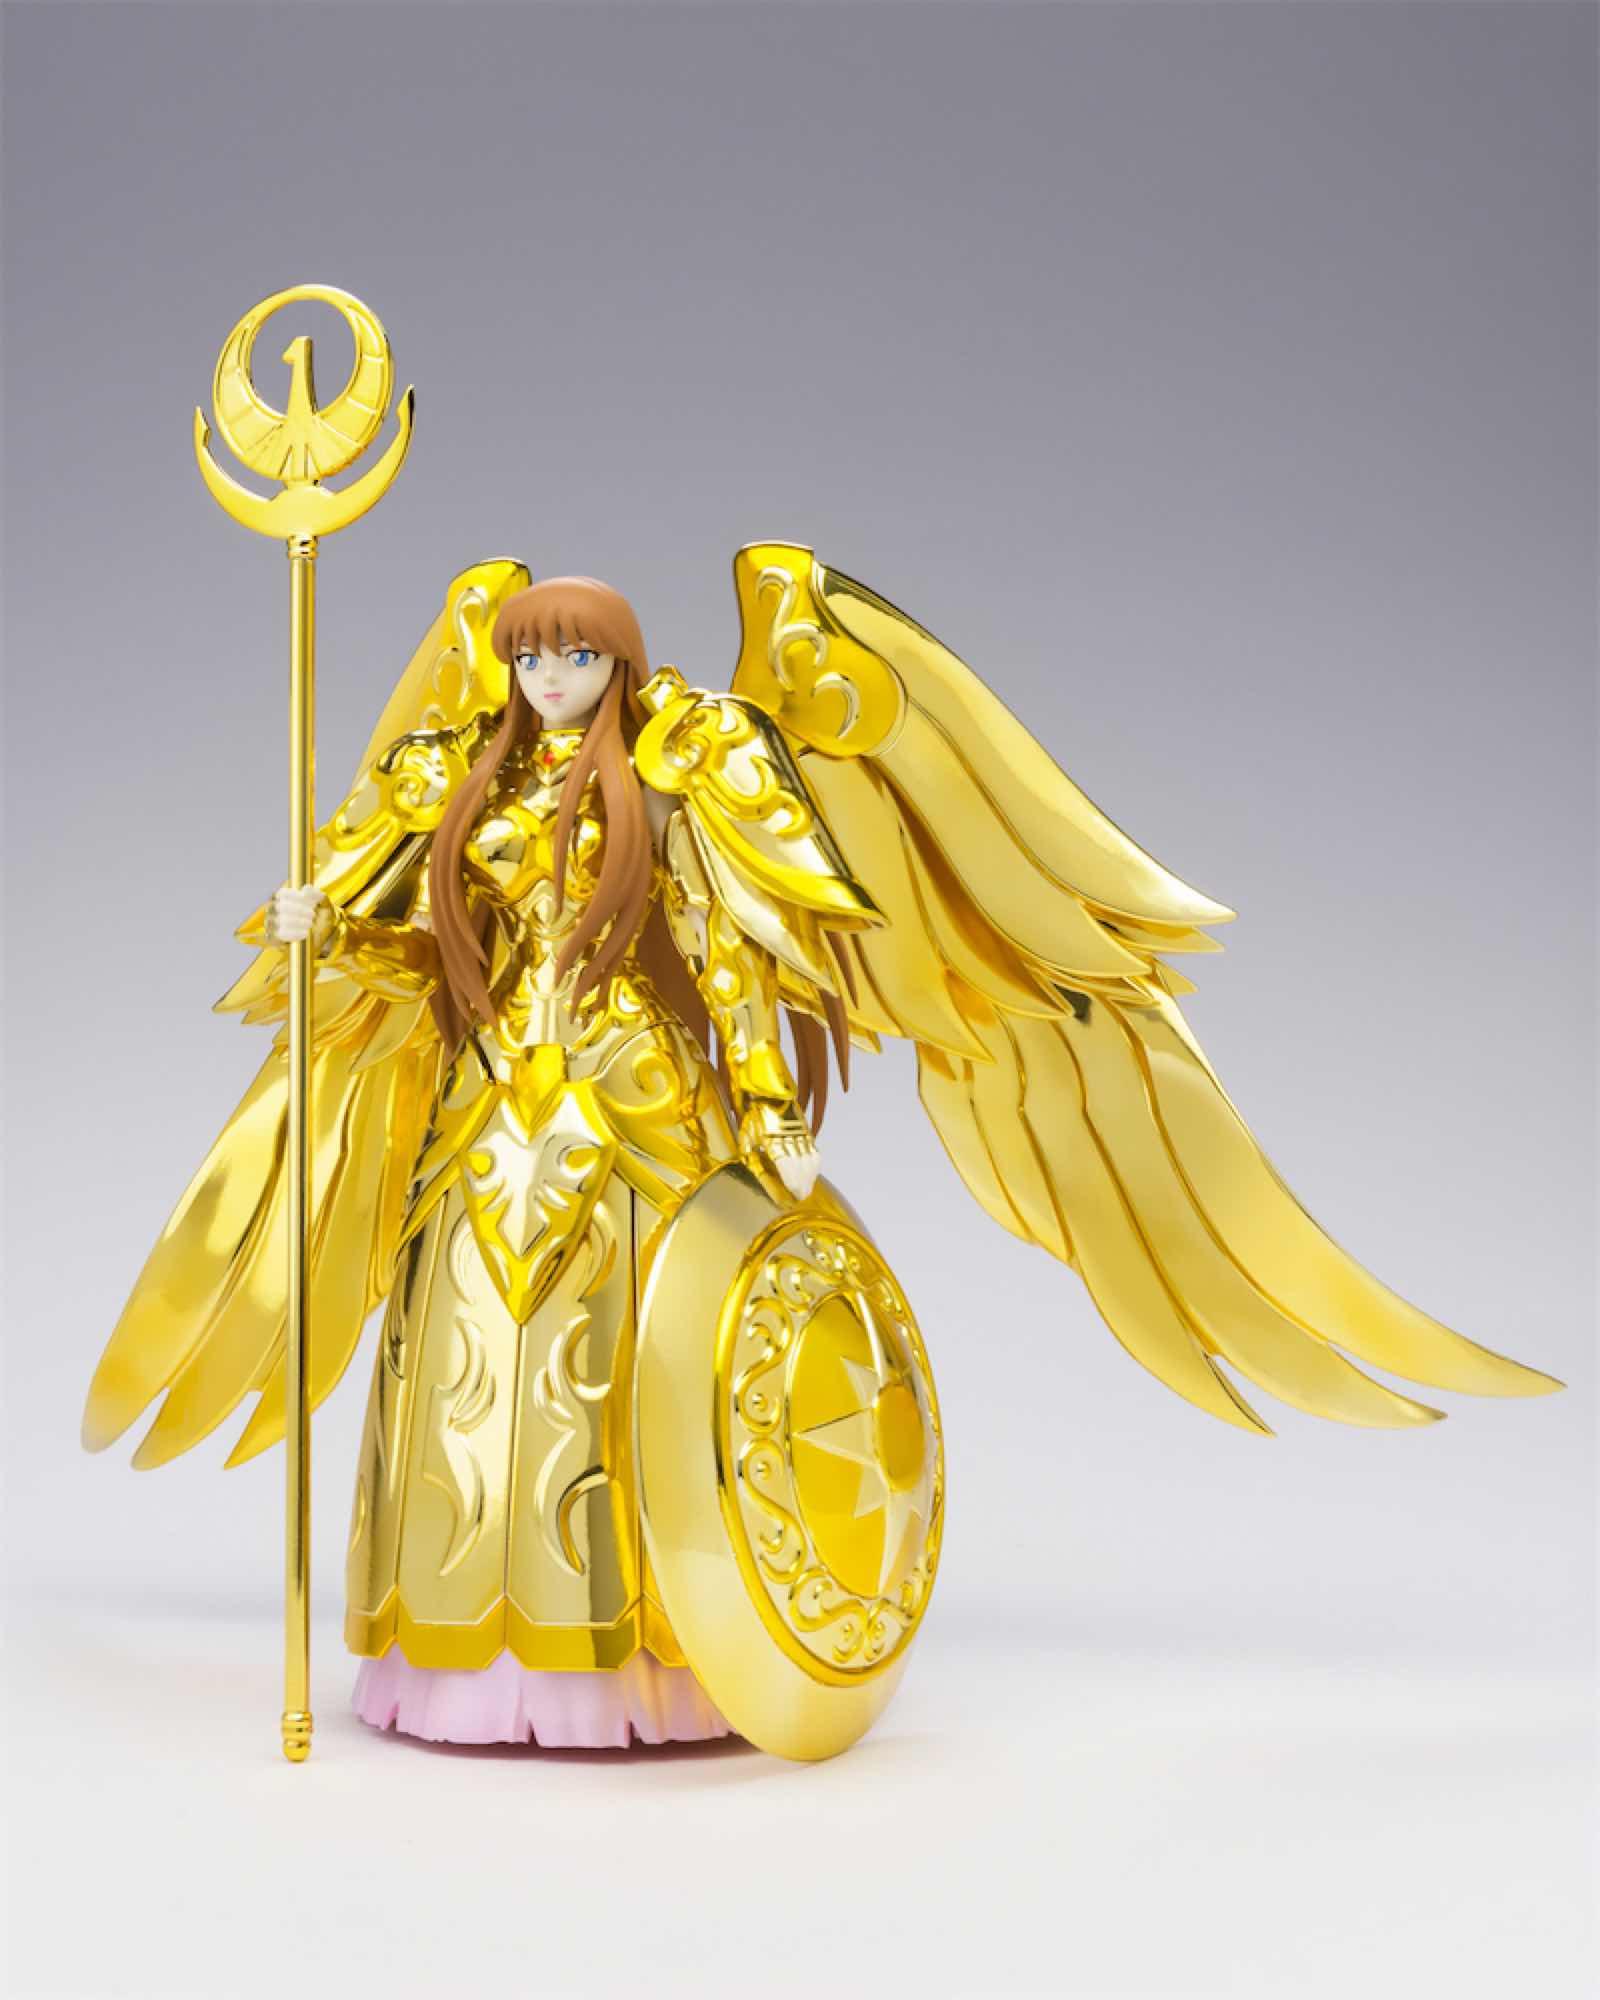 ATHENA GODDESS OCE TAMASHII WORLD TOUR FIGURA 17 CM SAINT SEIYA CLOTH MYTH